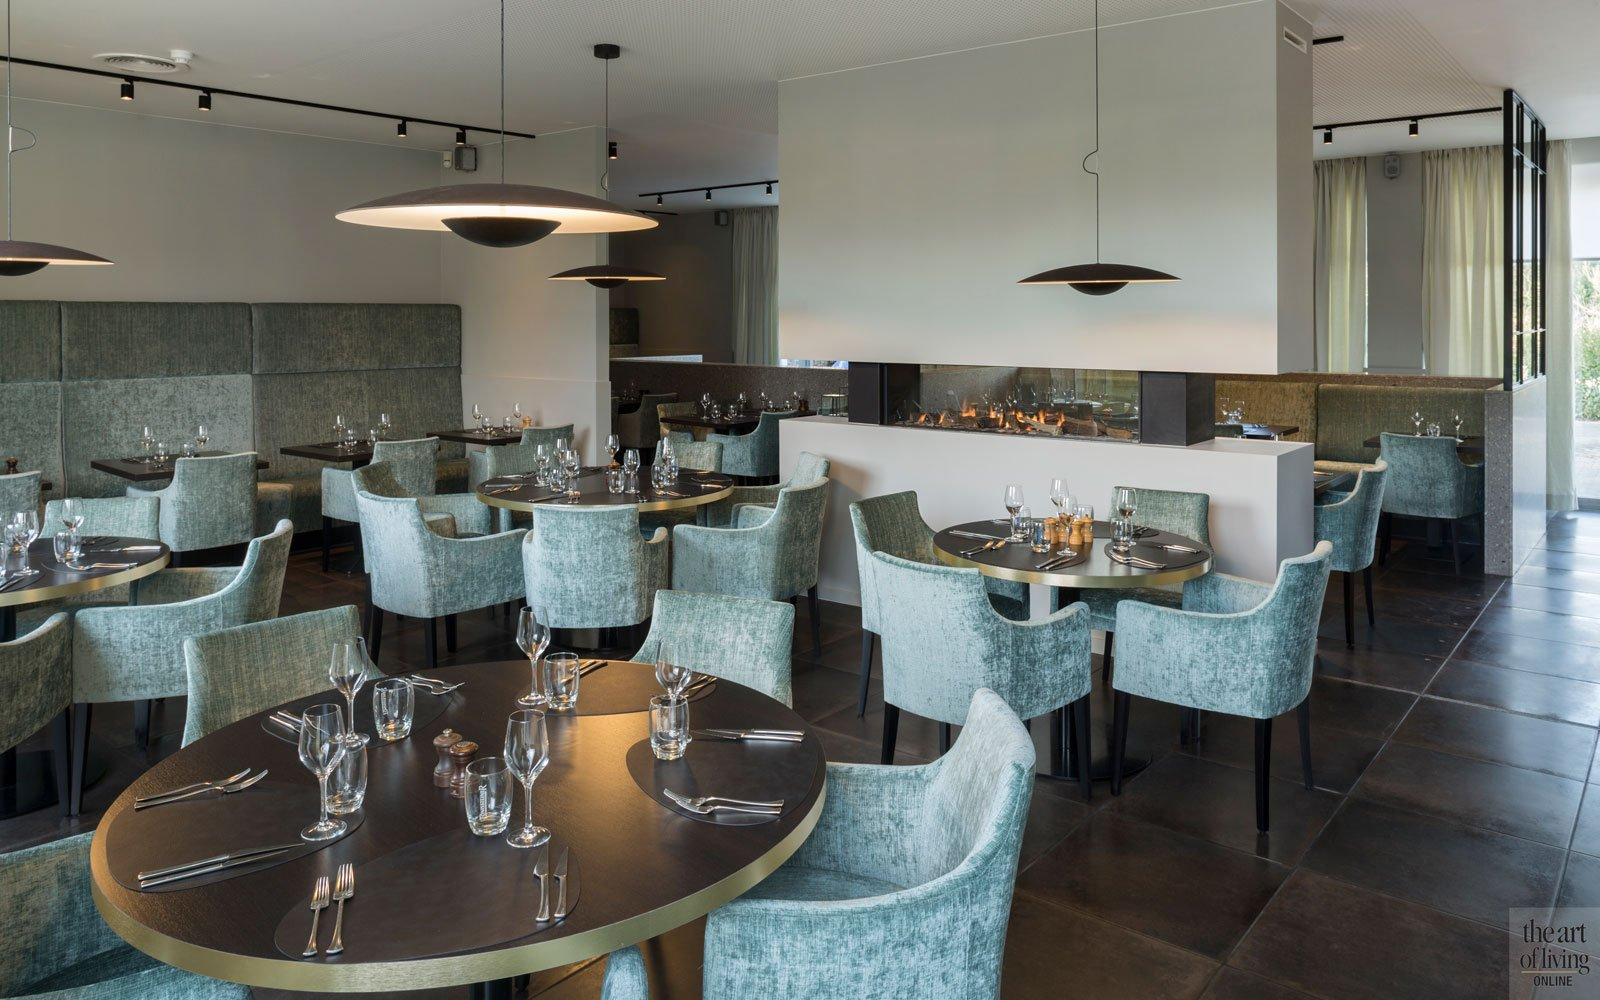 Gashaard van Heynicnk, ambiance, eyecatcher, Restaurant Chaflo & Co, Bouw-iD